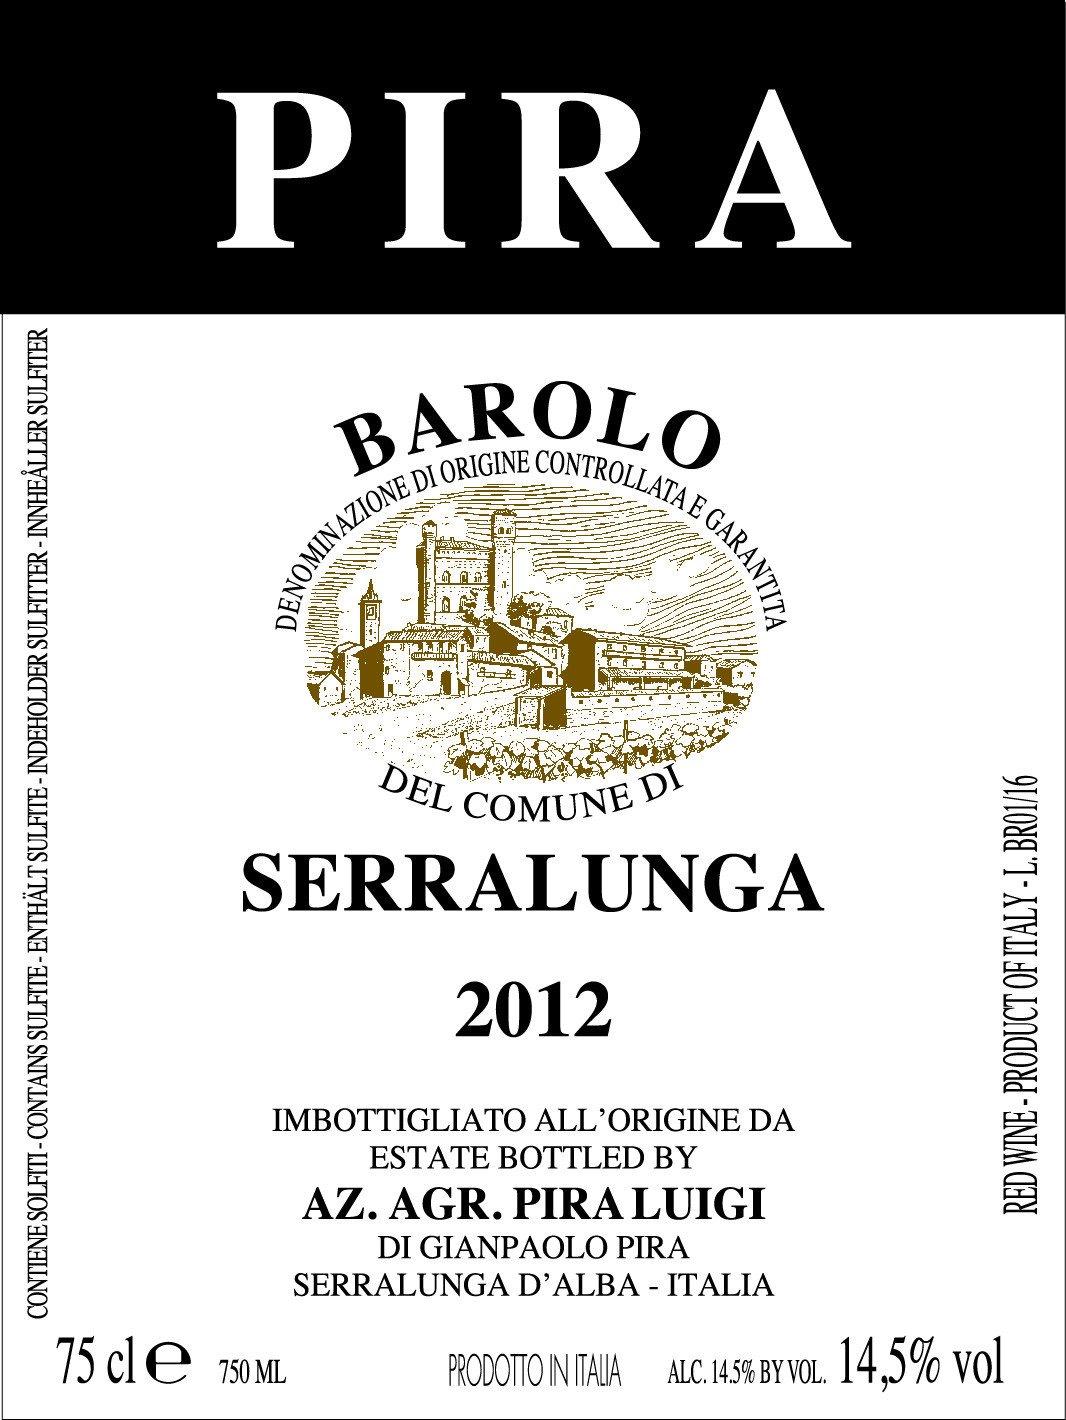 Pira Barolo Serralunga 2012